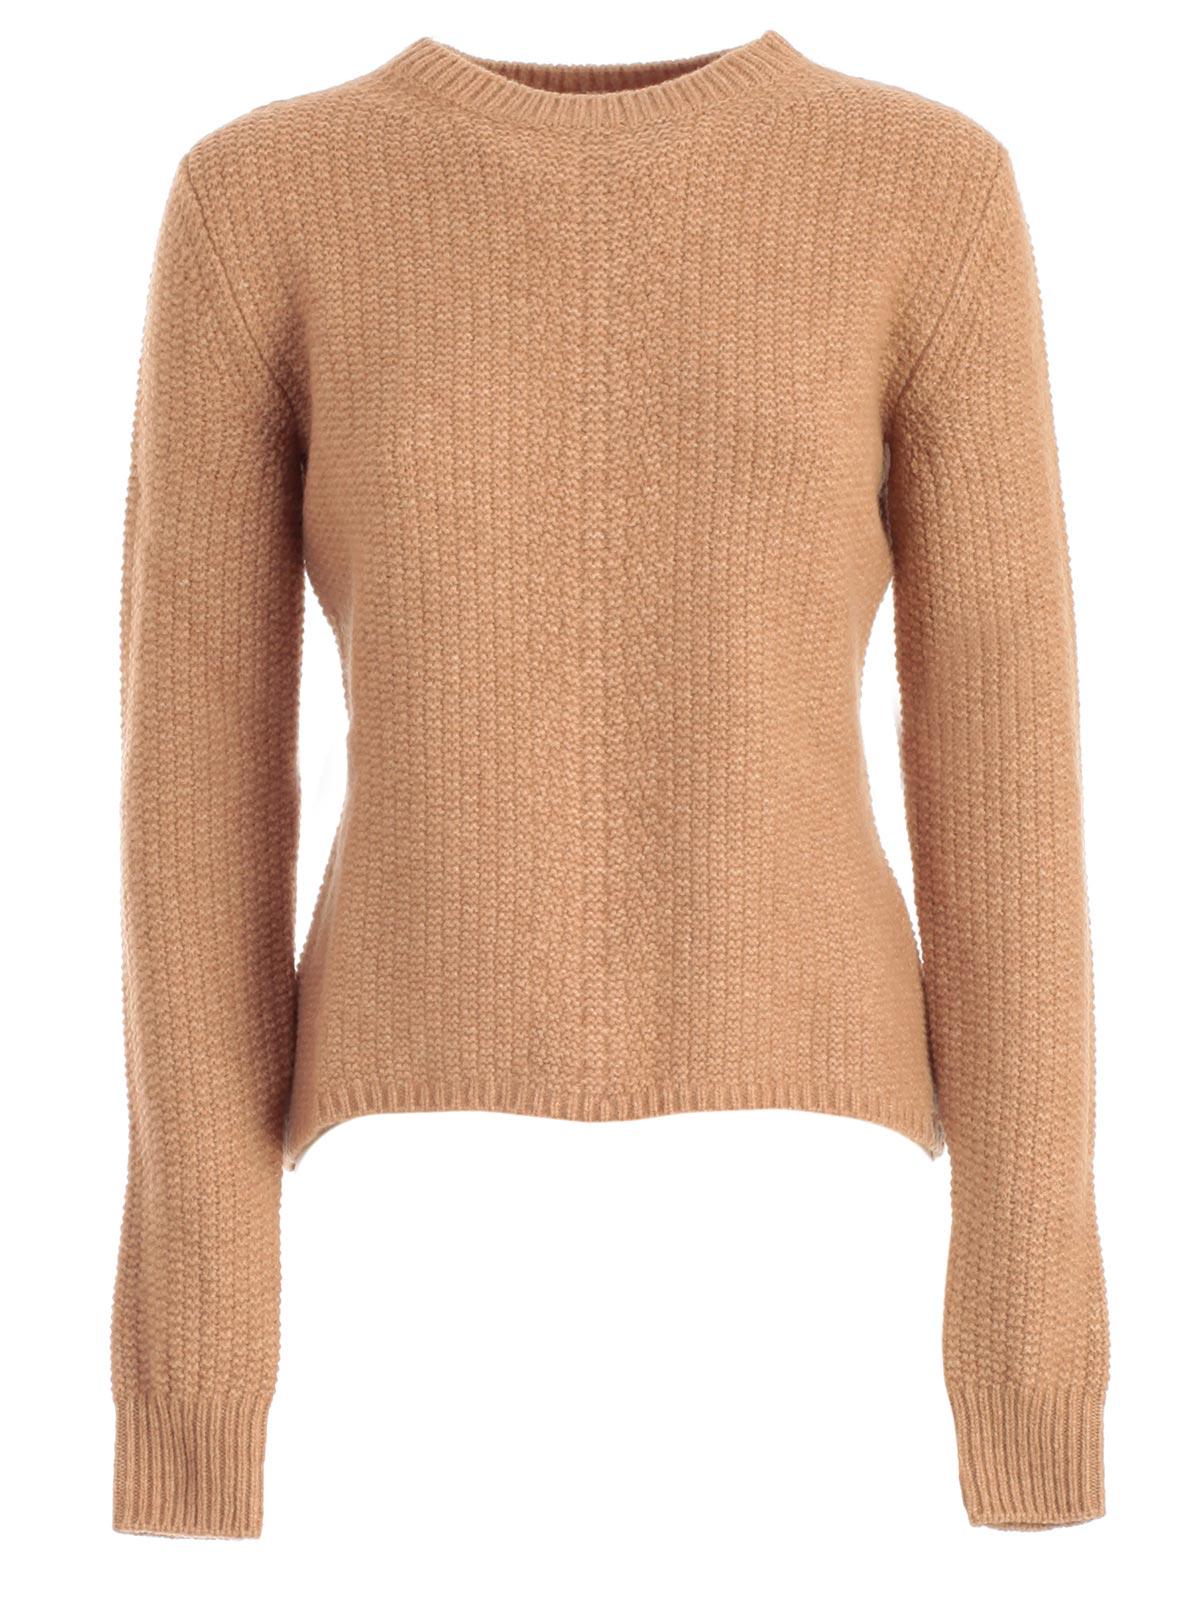 Picture of Max Mara Sweater